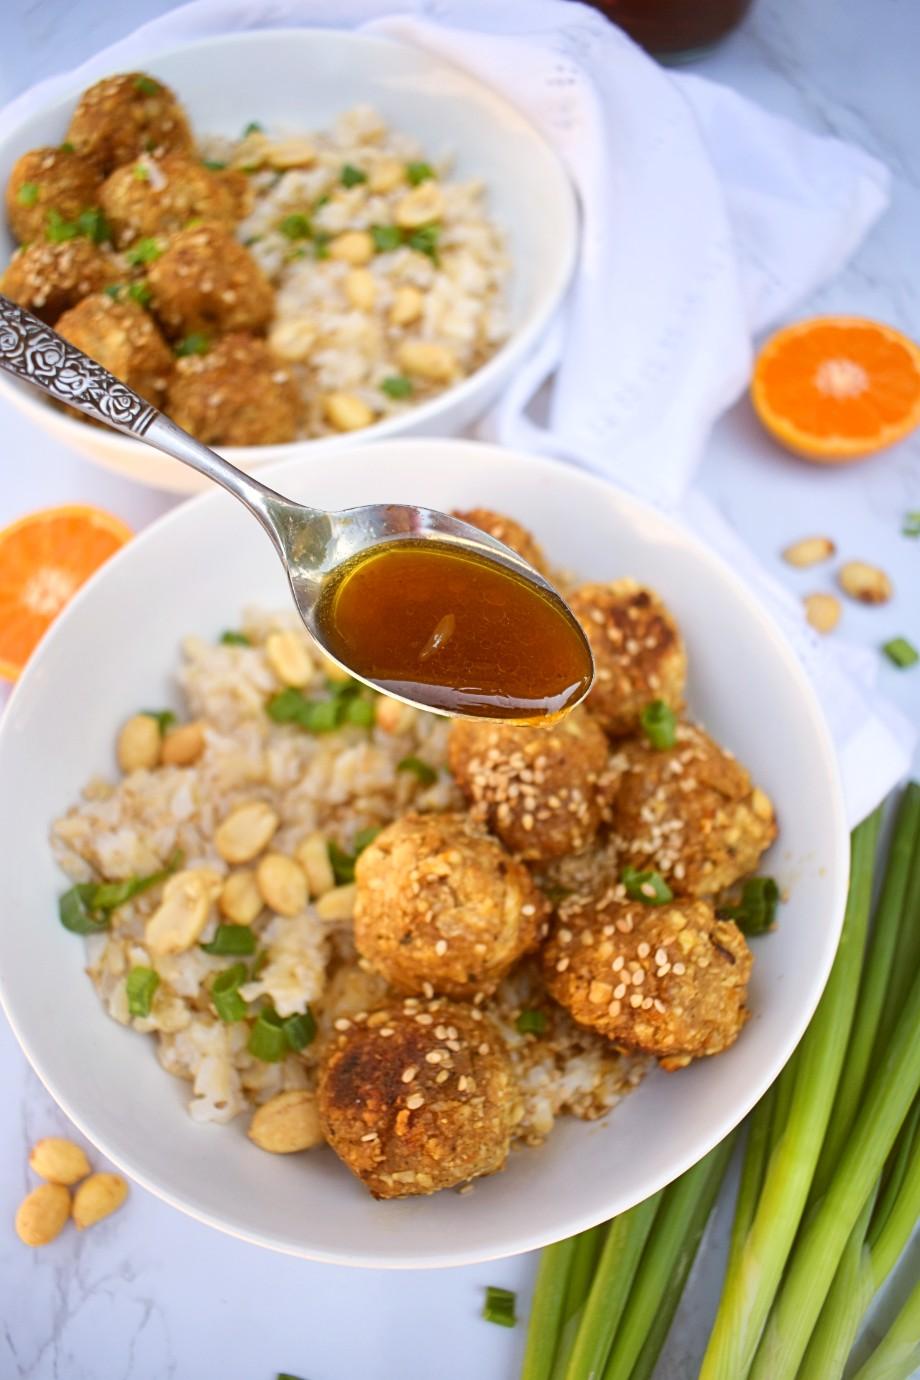 Sticky Vegan Peanut Meatballs